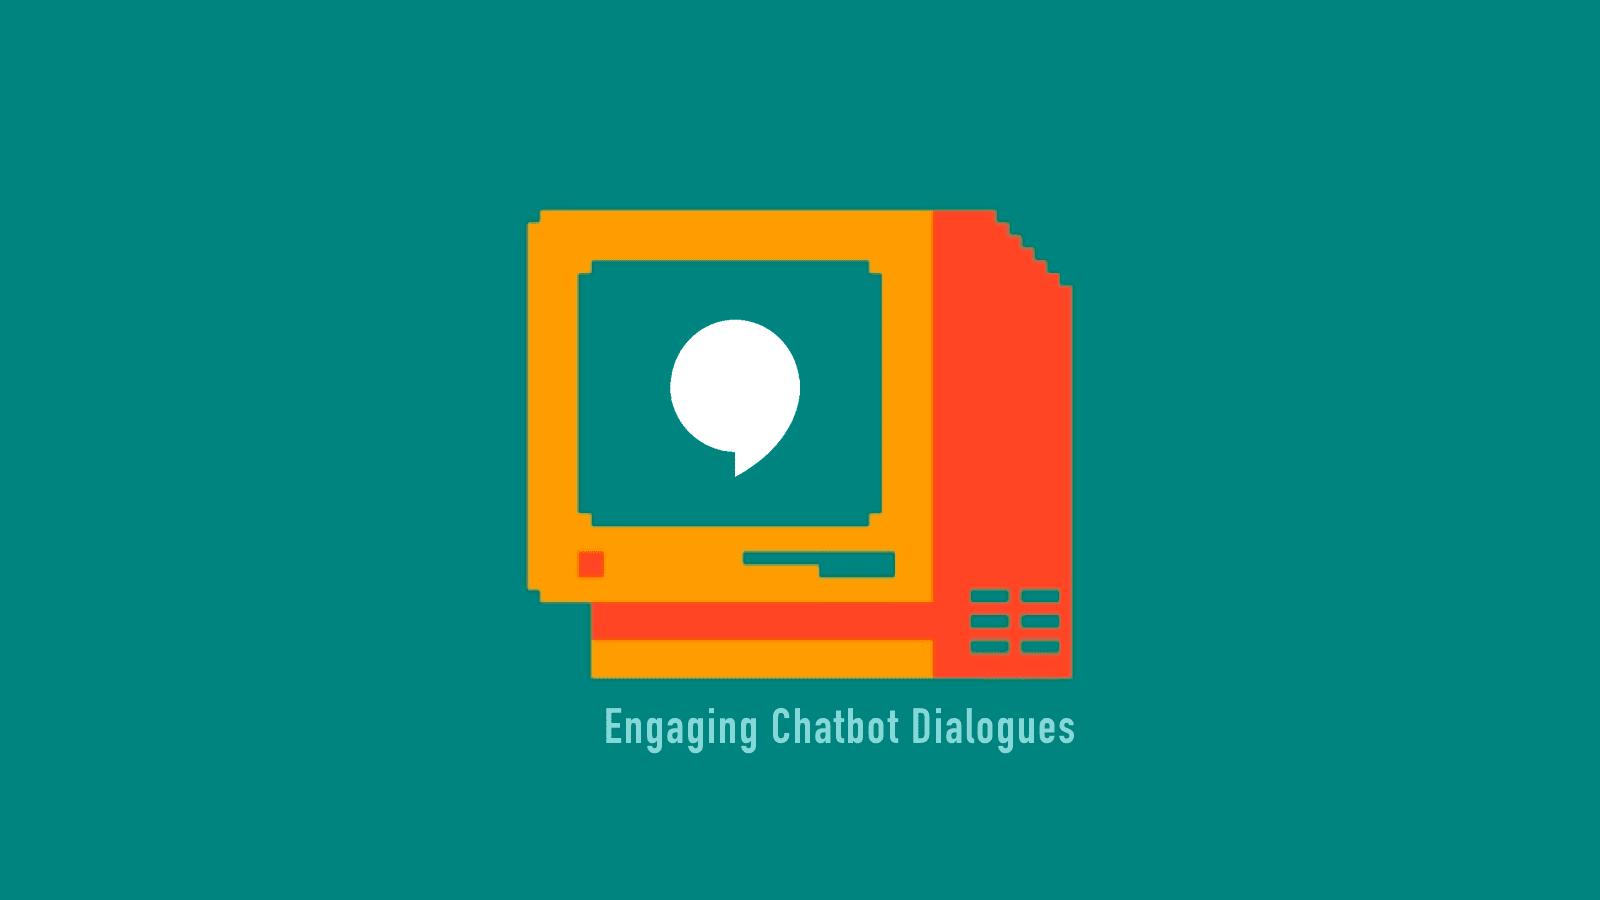 Write Winning Dialogues for Conversational UI - Like Top Brands